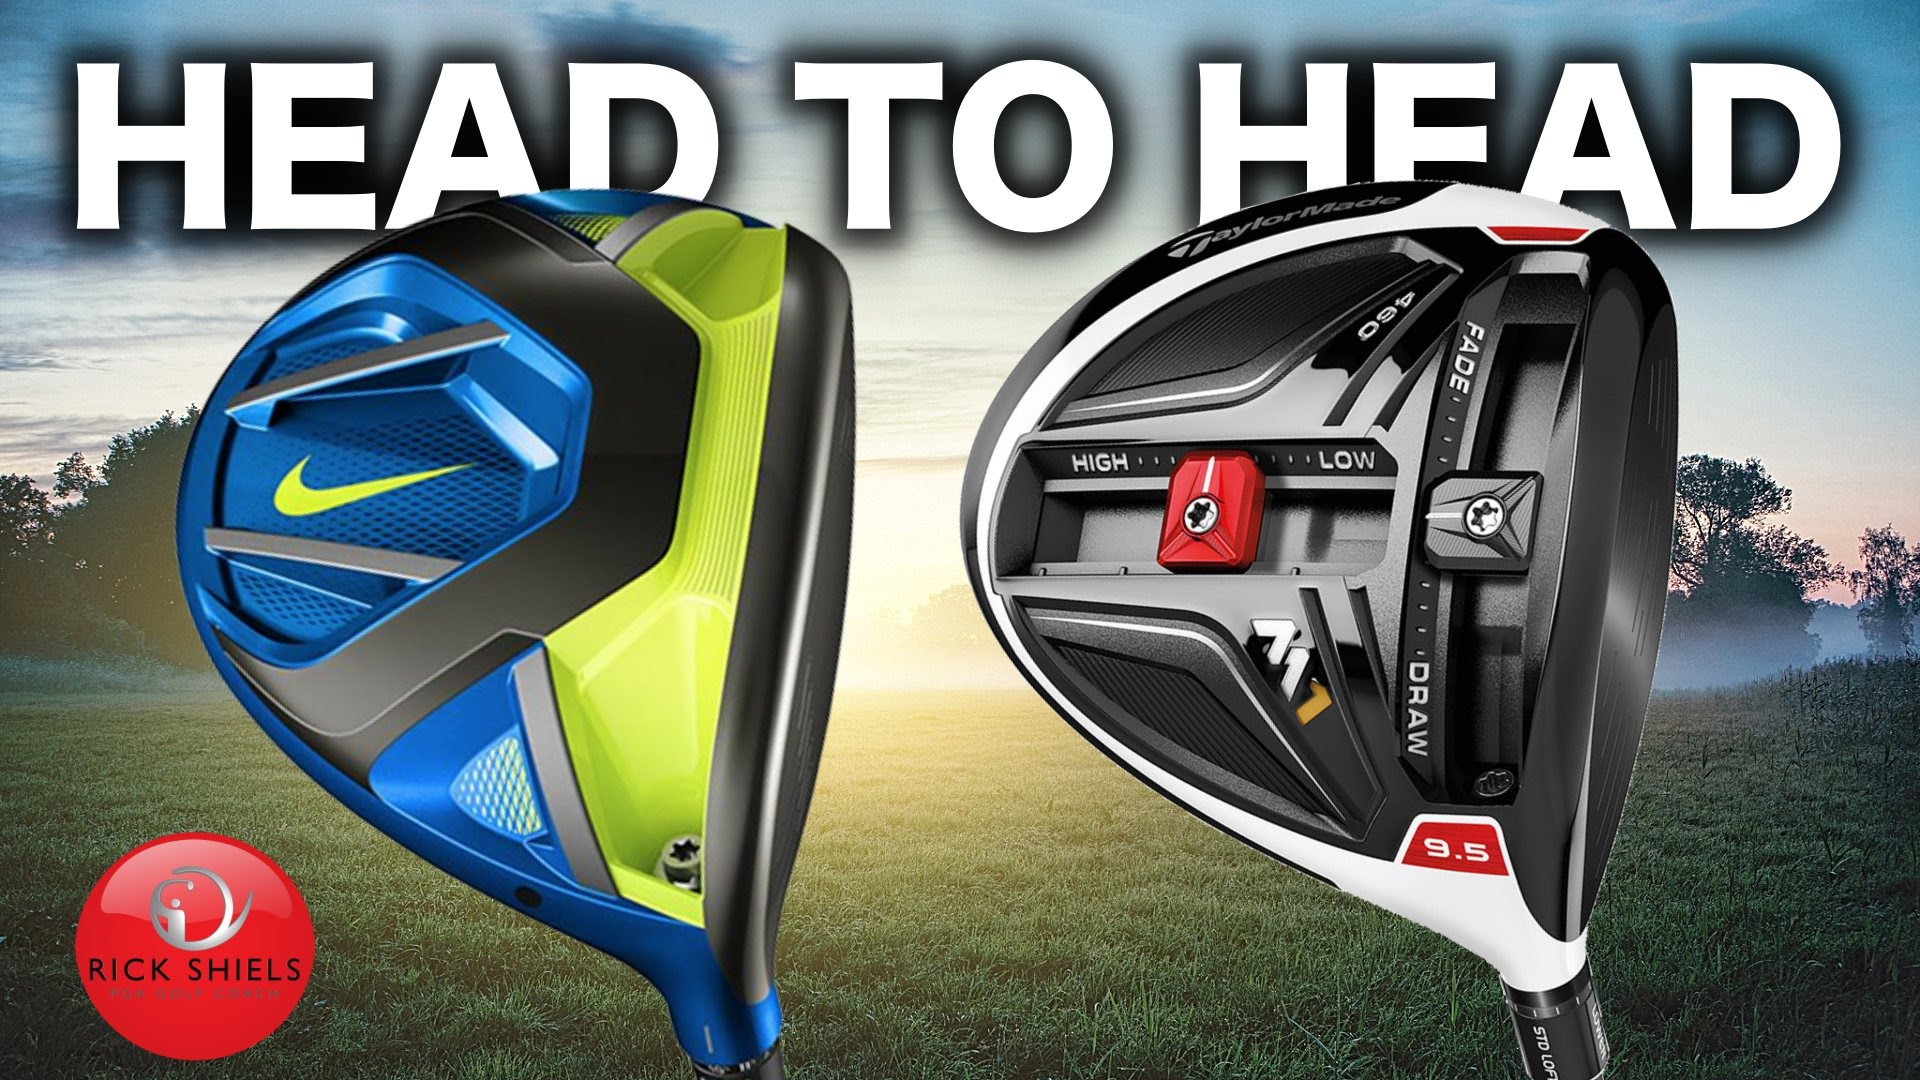 Head-to-Head Driver Test: Nike Vapor Fly Pro v. TaylorMade M1 460 – GolfWRX